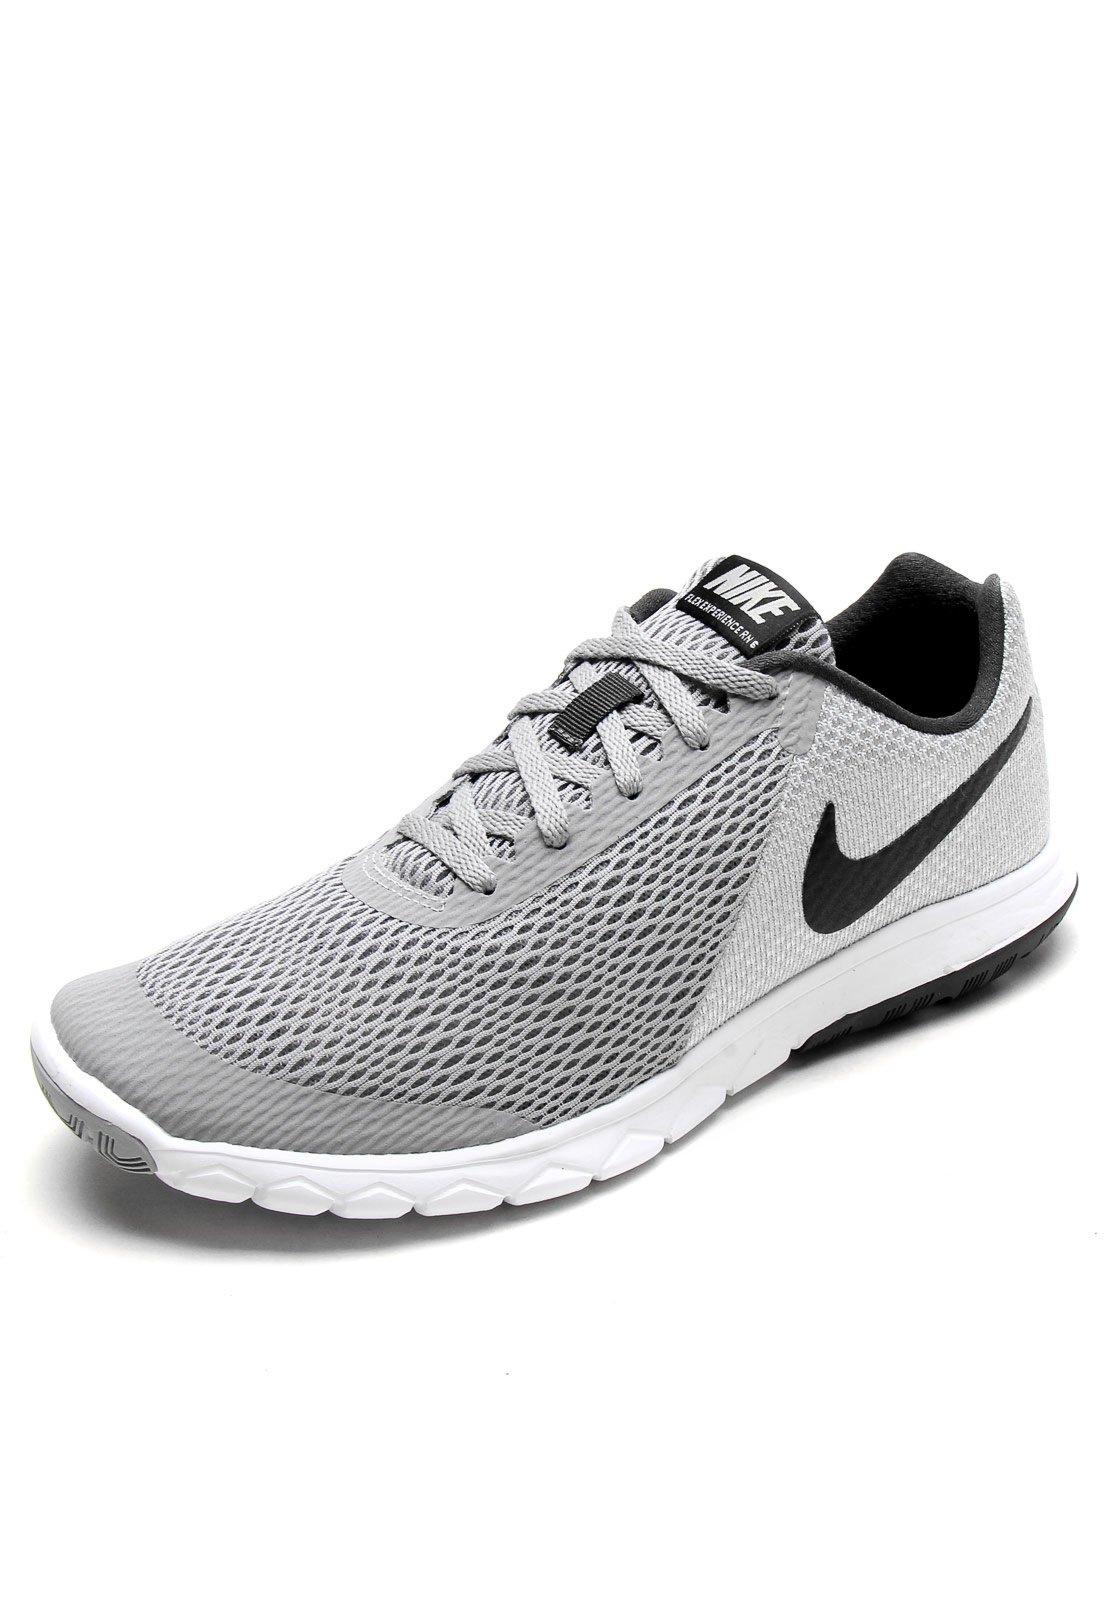 bostezando sentido común matar  Tênis Nike Flex Experience RN 6 Cinza/Preto - Compre Agora   Dafiti Brasil